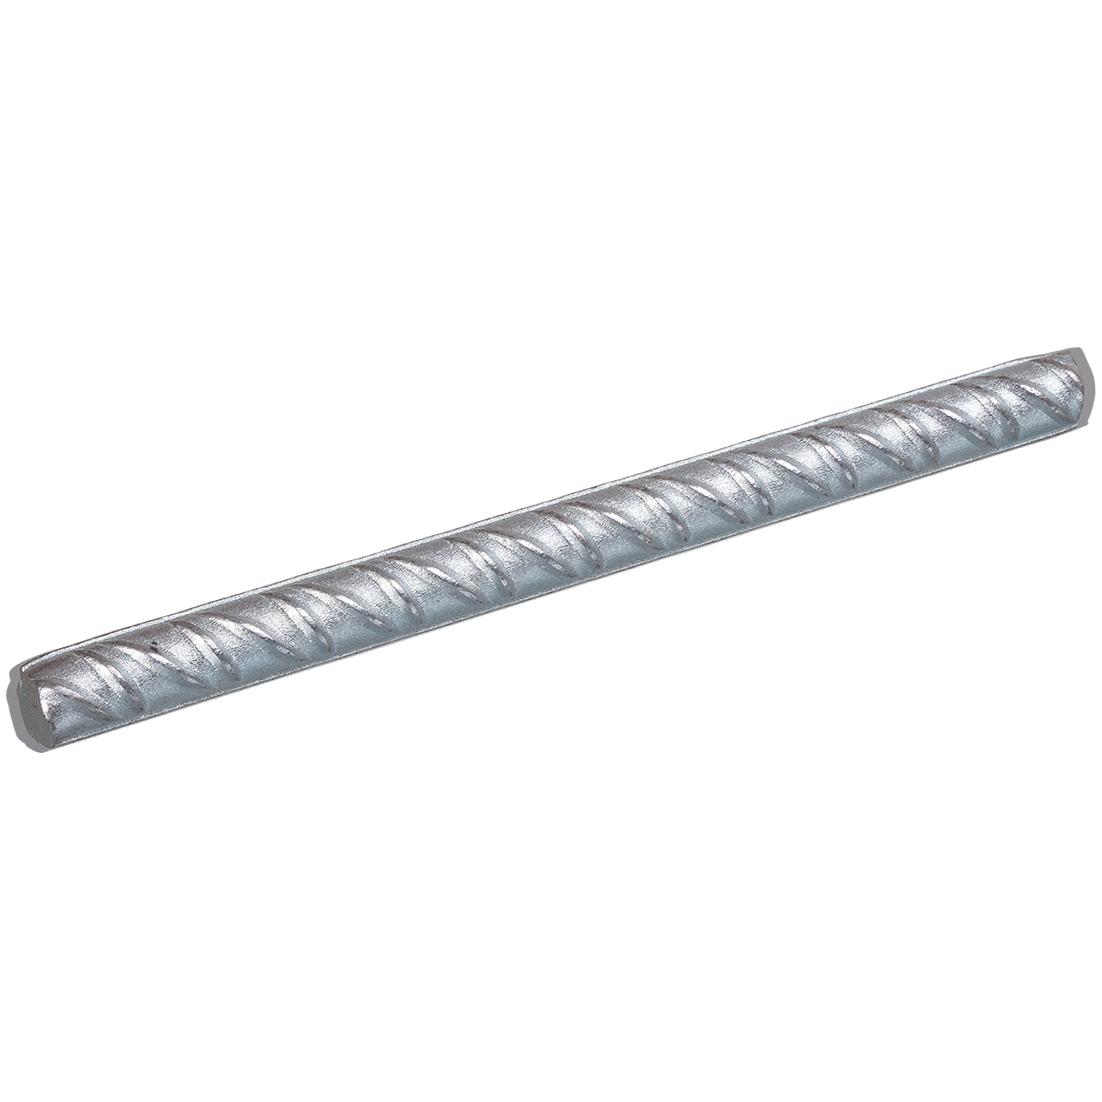 Grabmaldübel ø 12 mm | Länge 1.000 mm